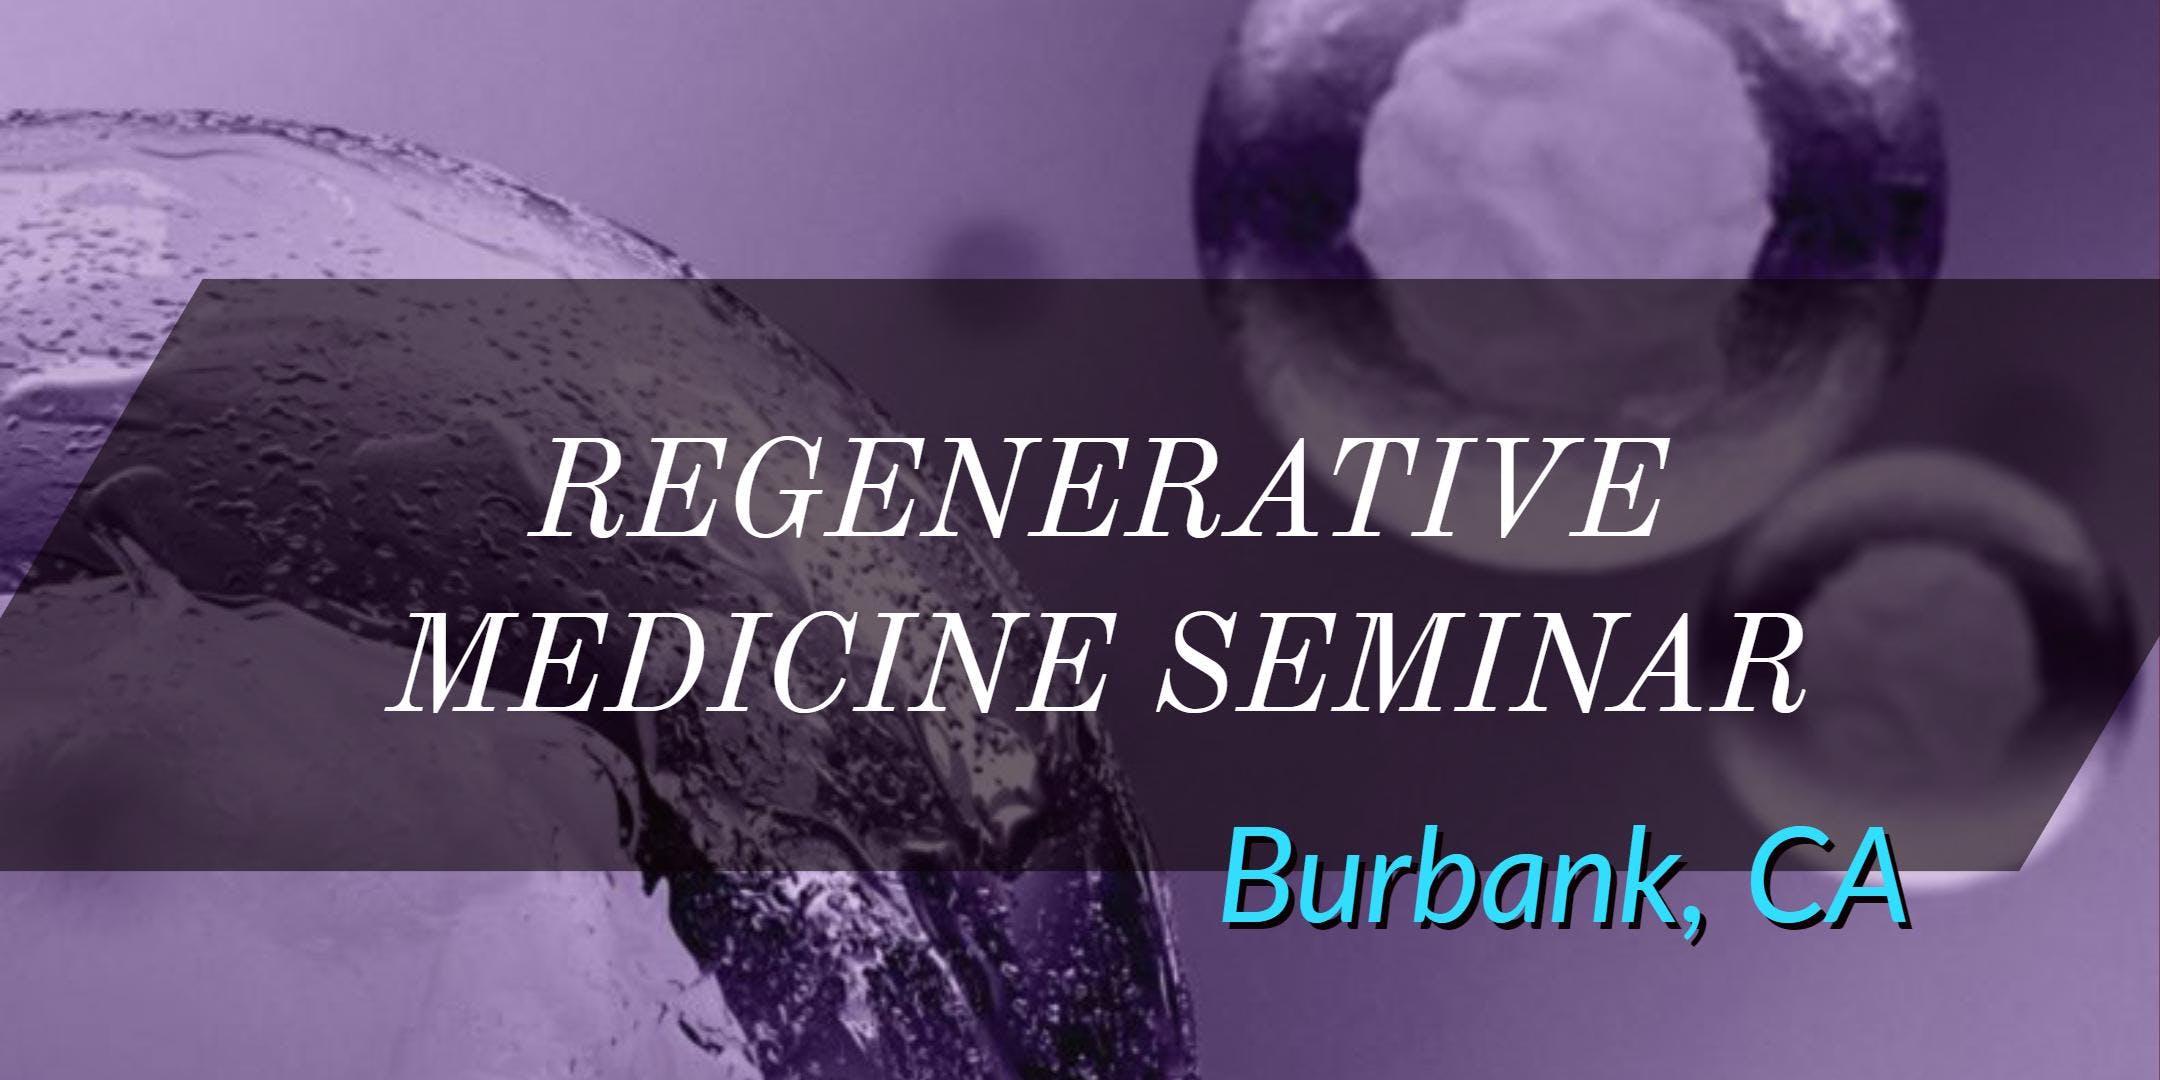 FREE Regenerative Medicine & Stem Cell For Pain Seminar - Burbank, CA